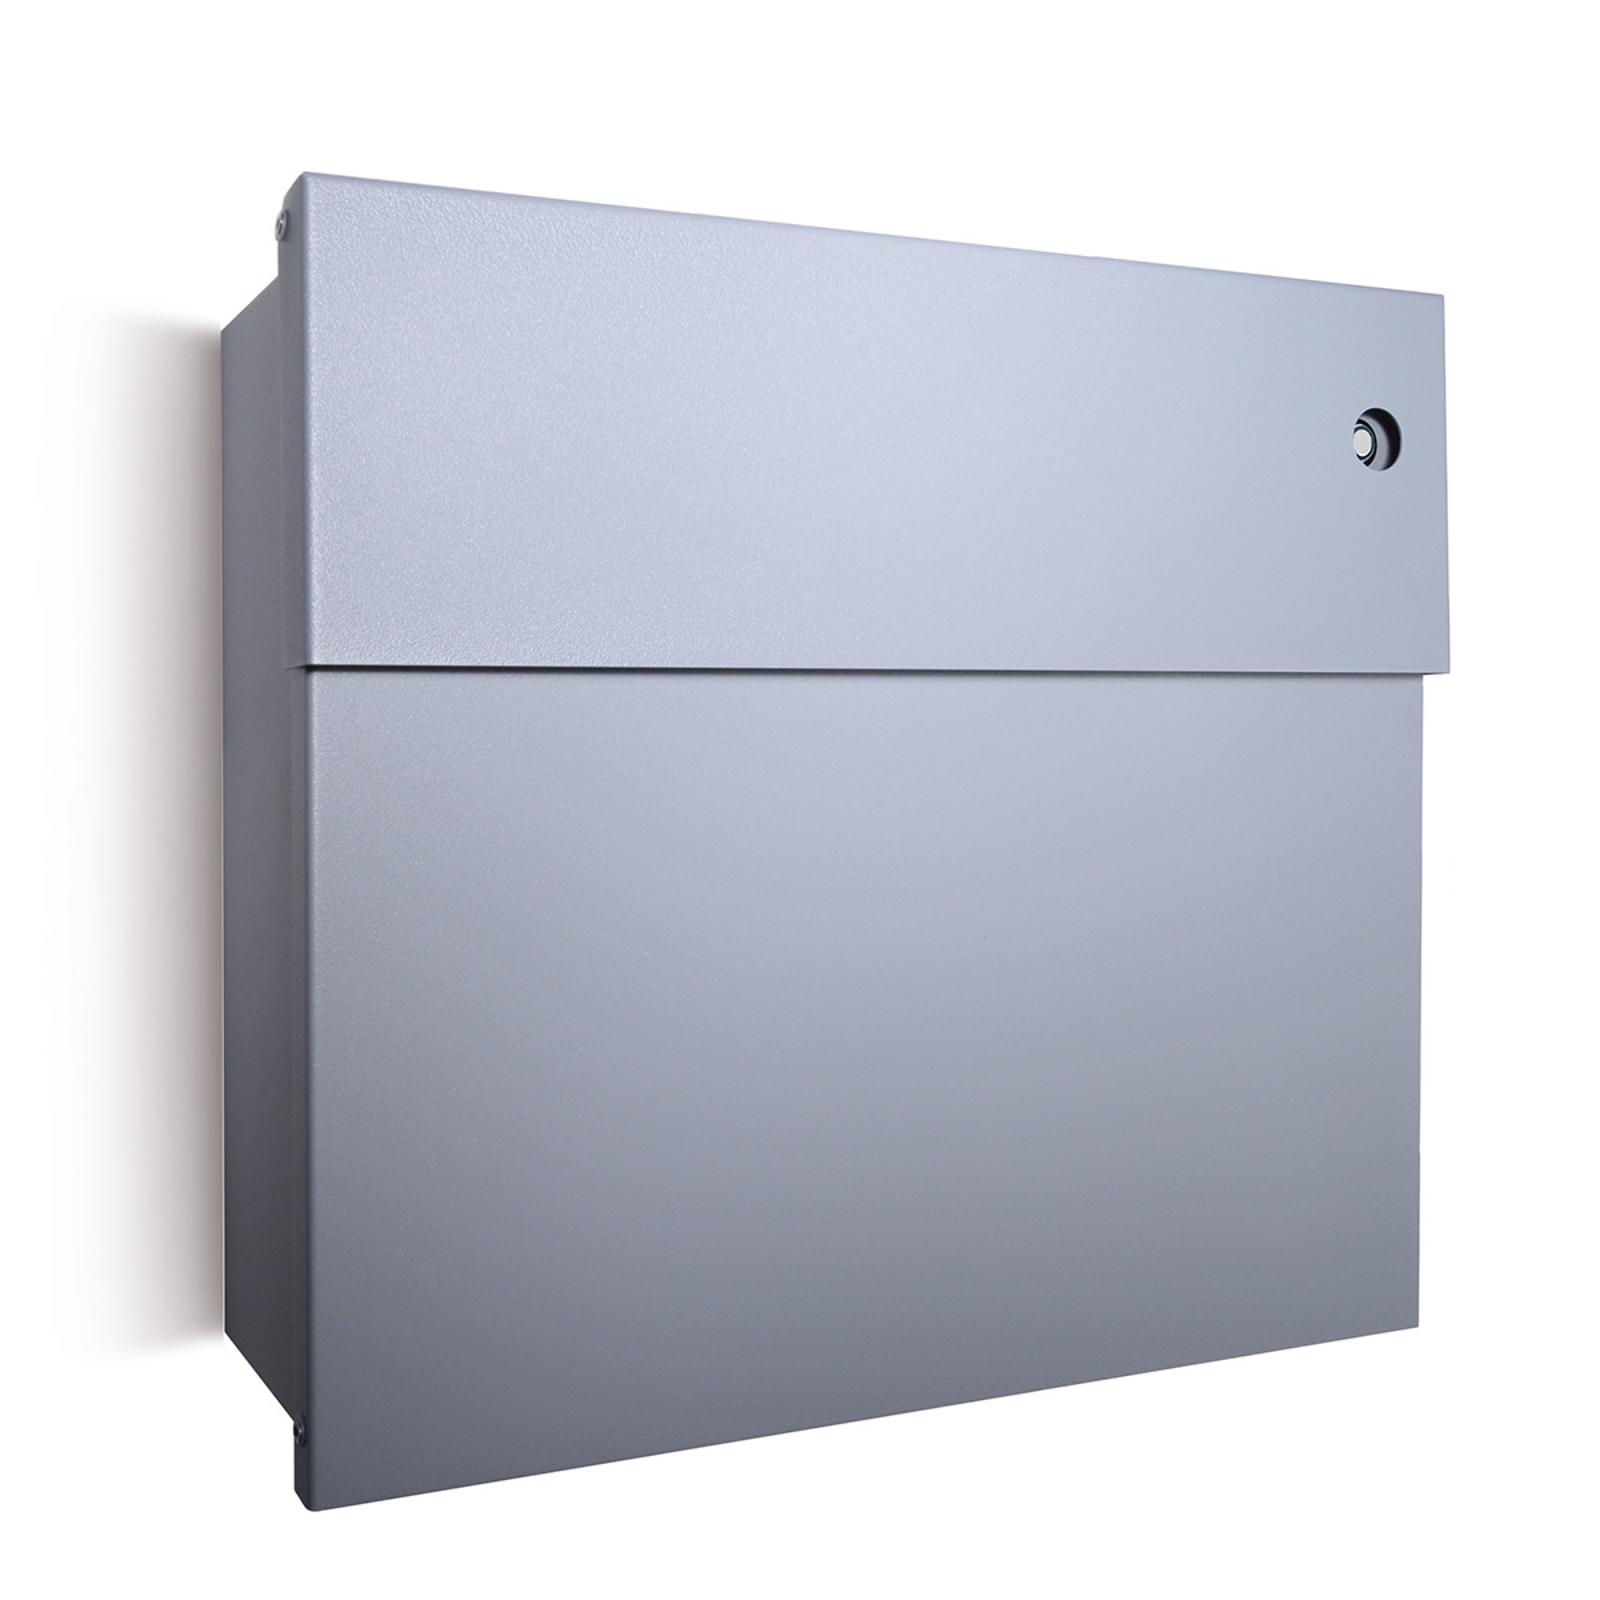 Letterman IV letterbox, blue doorbell, silver_1057151_1